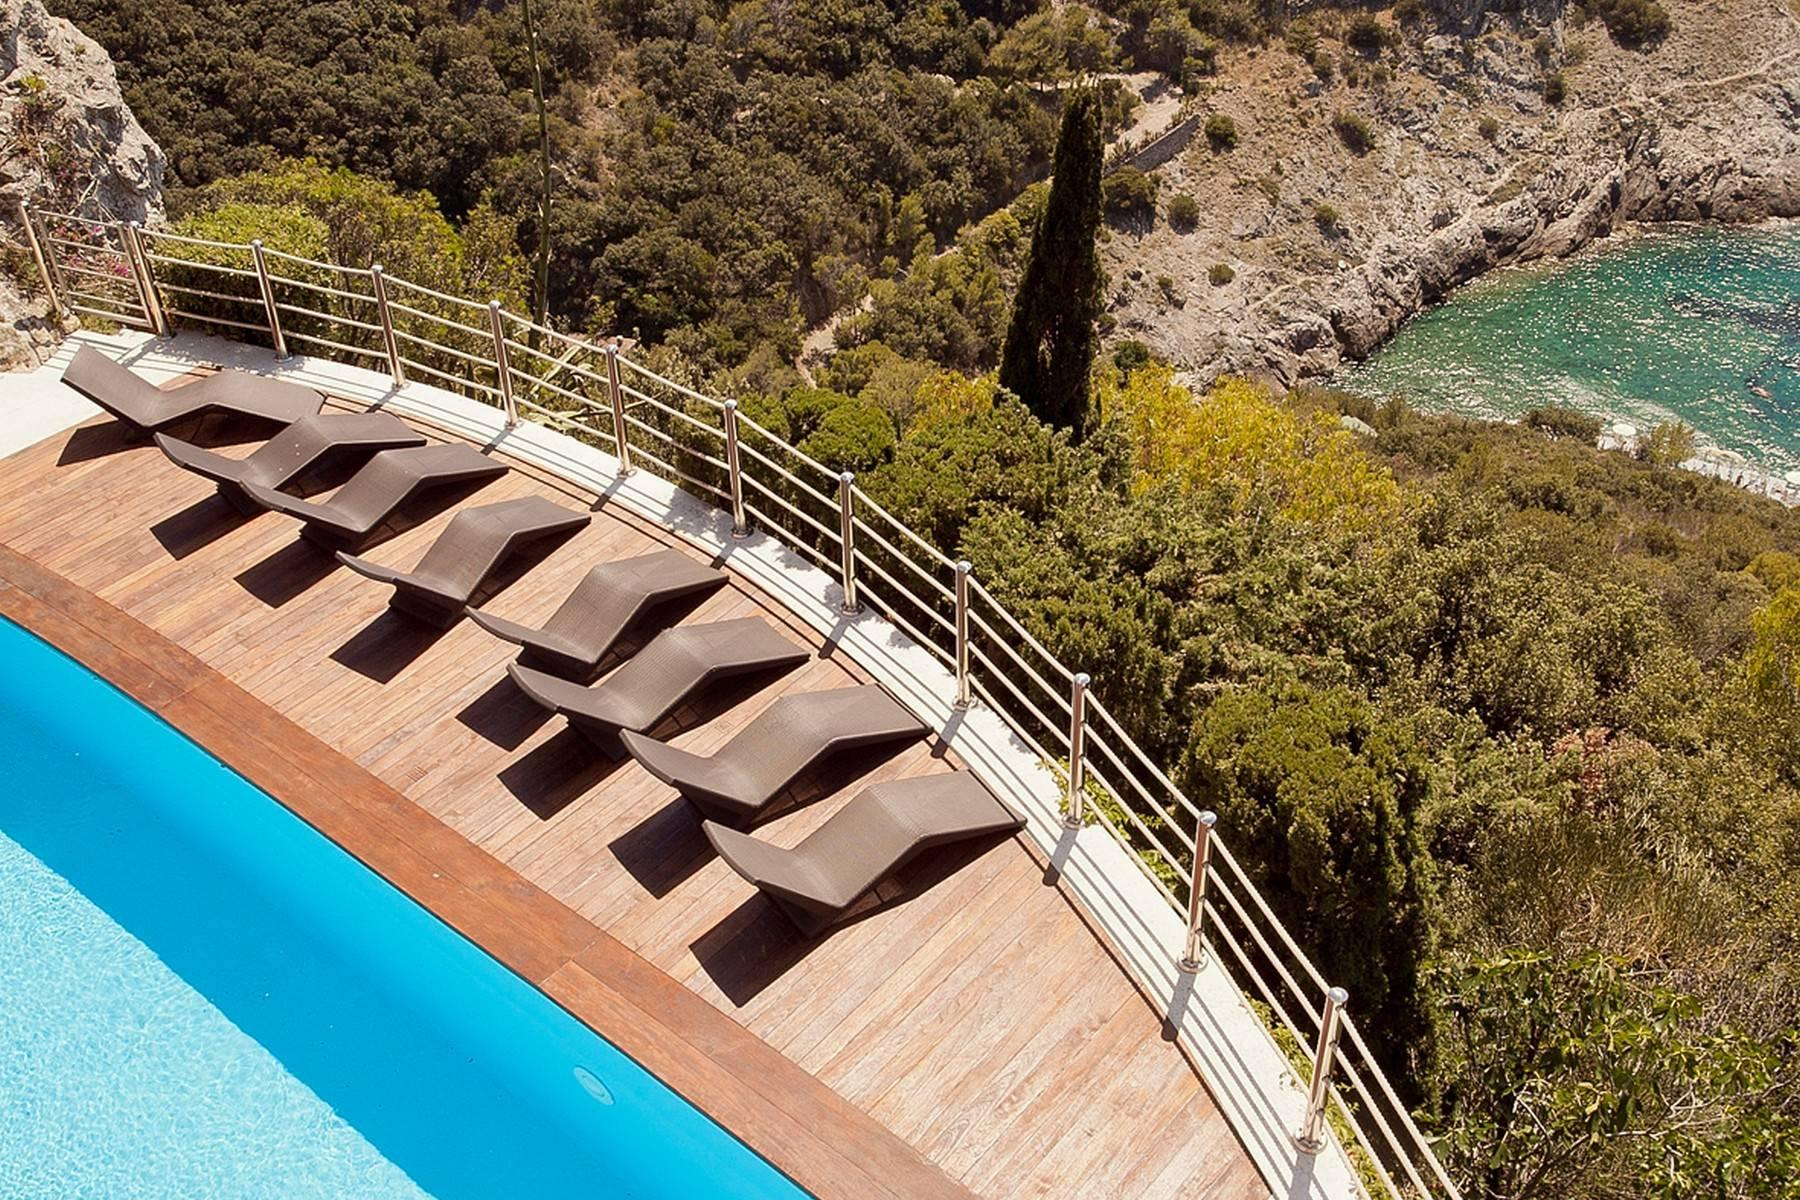 Splendida villa pied dans l'eau all'Argentario - 5